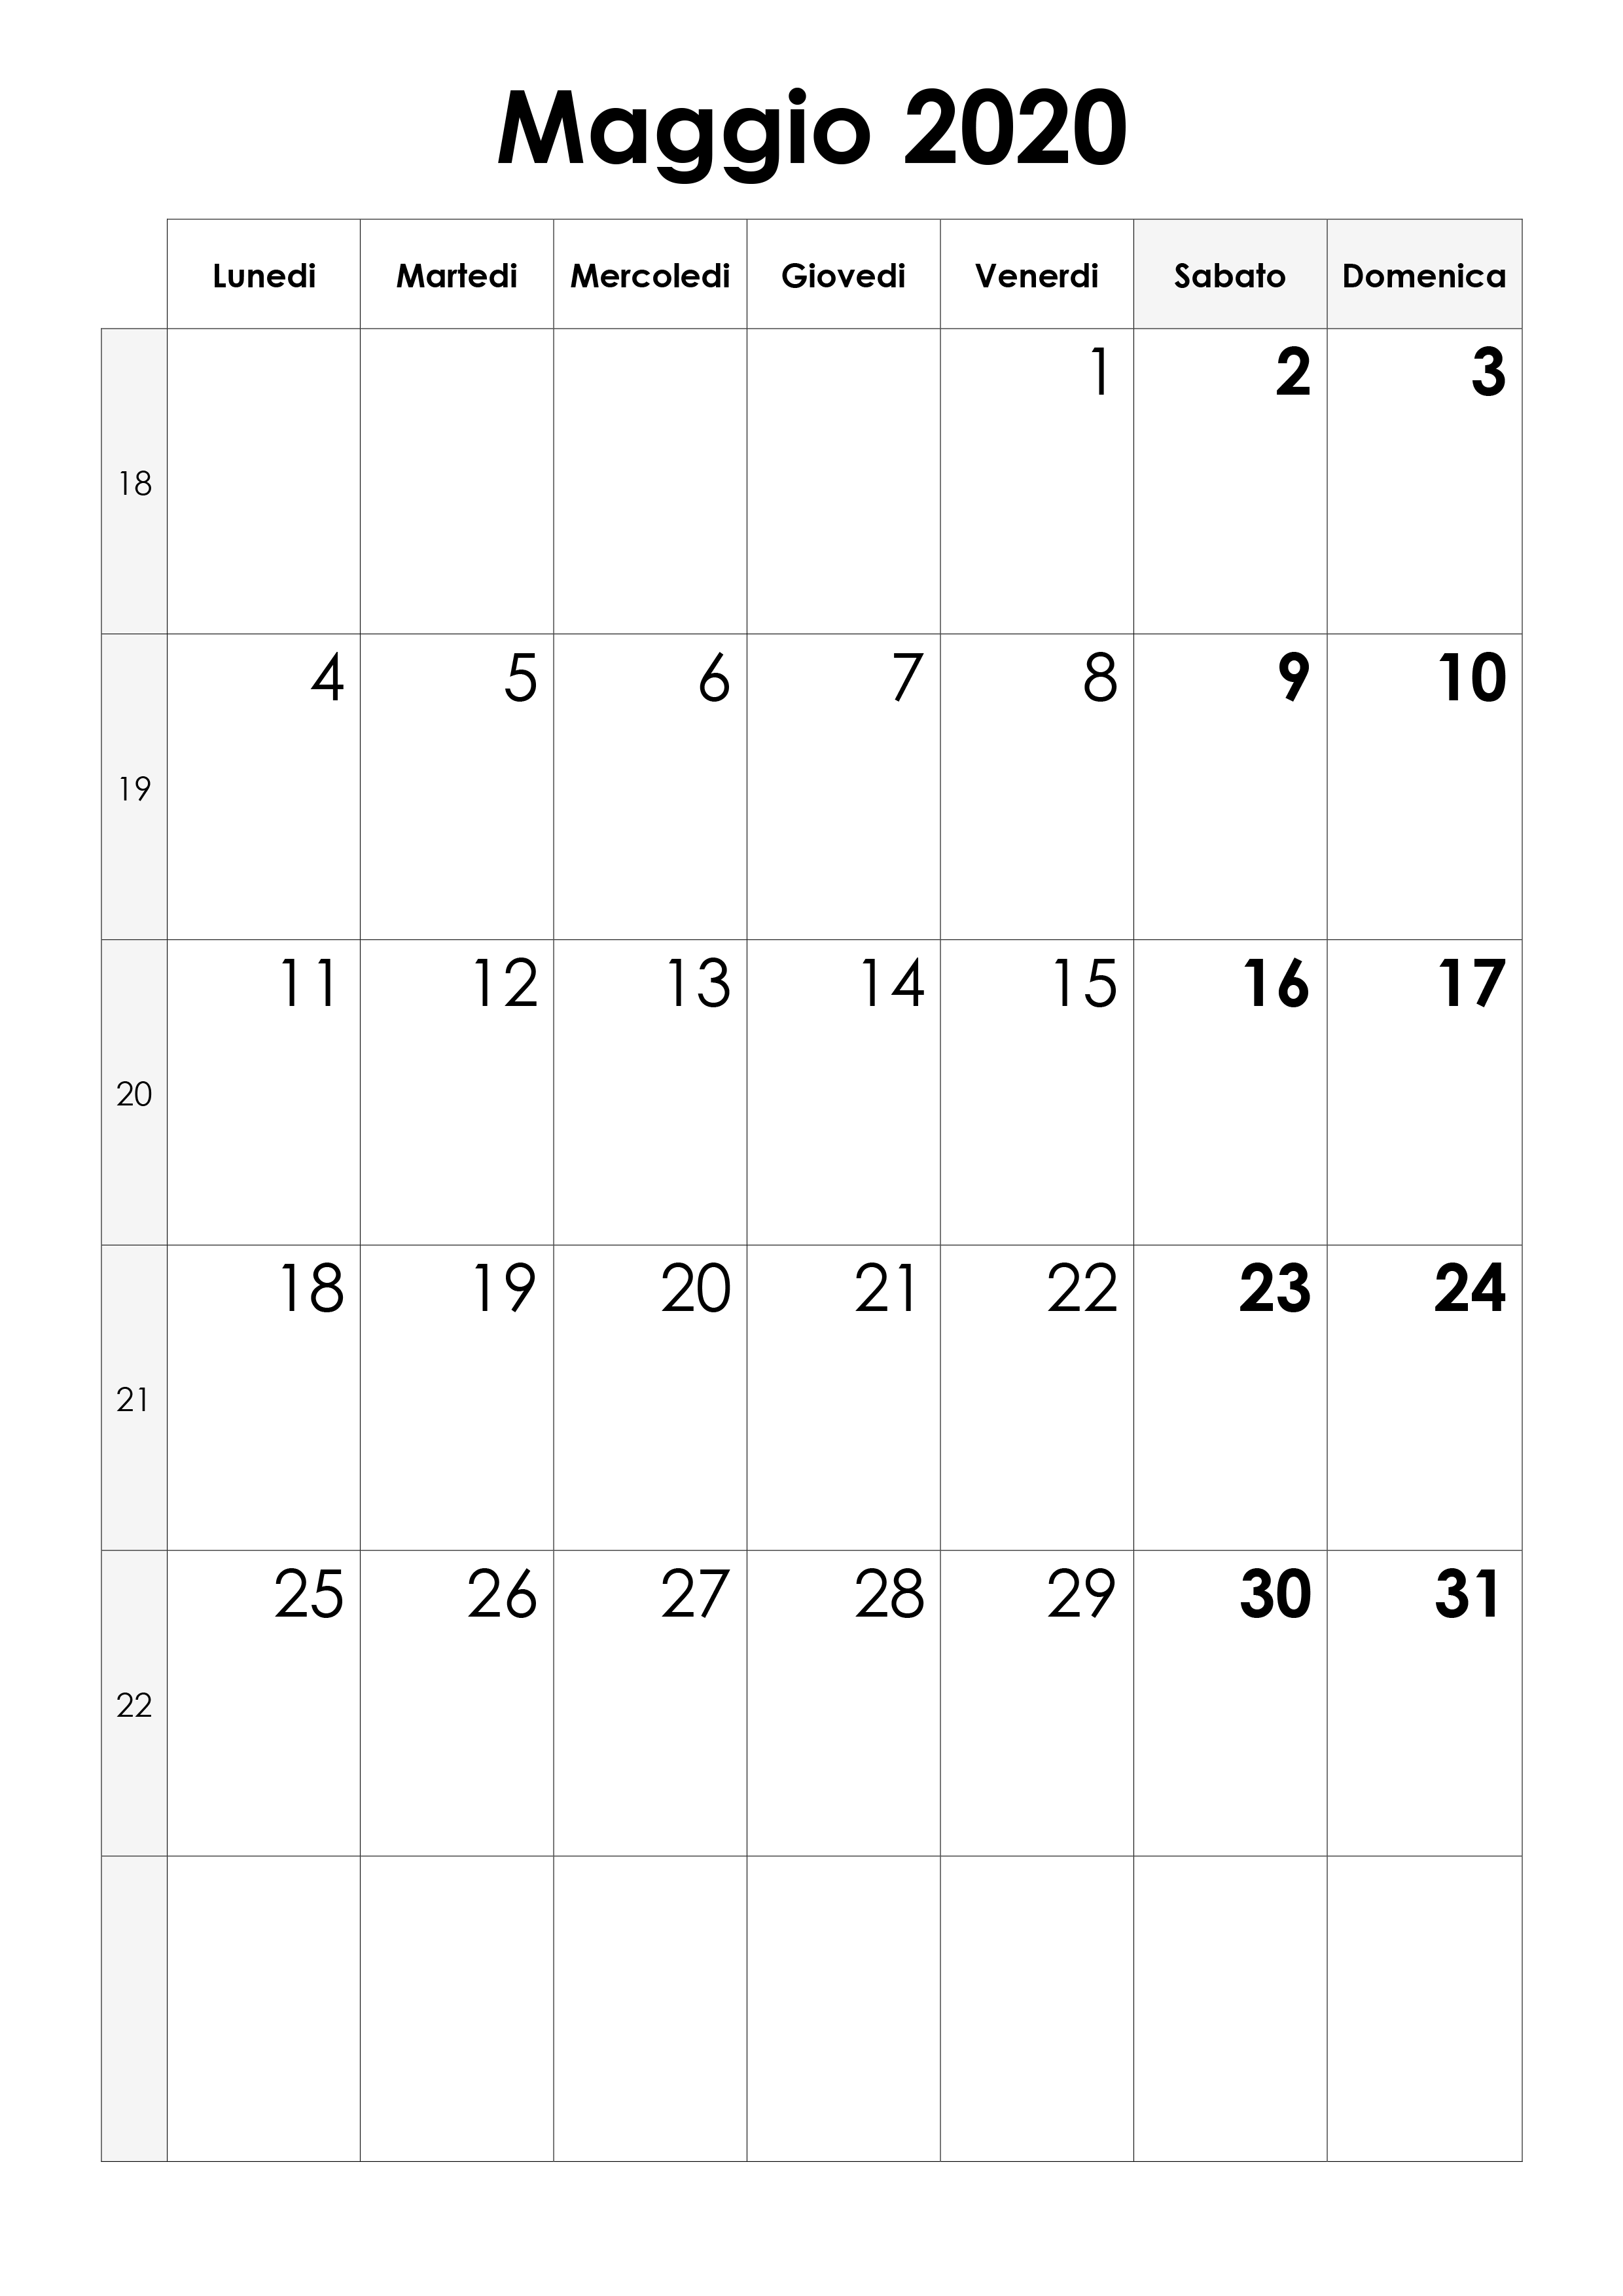 Calendario Maggio 2020.Calendario Maggio 2020 Calendario Su